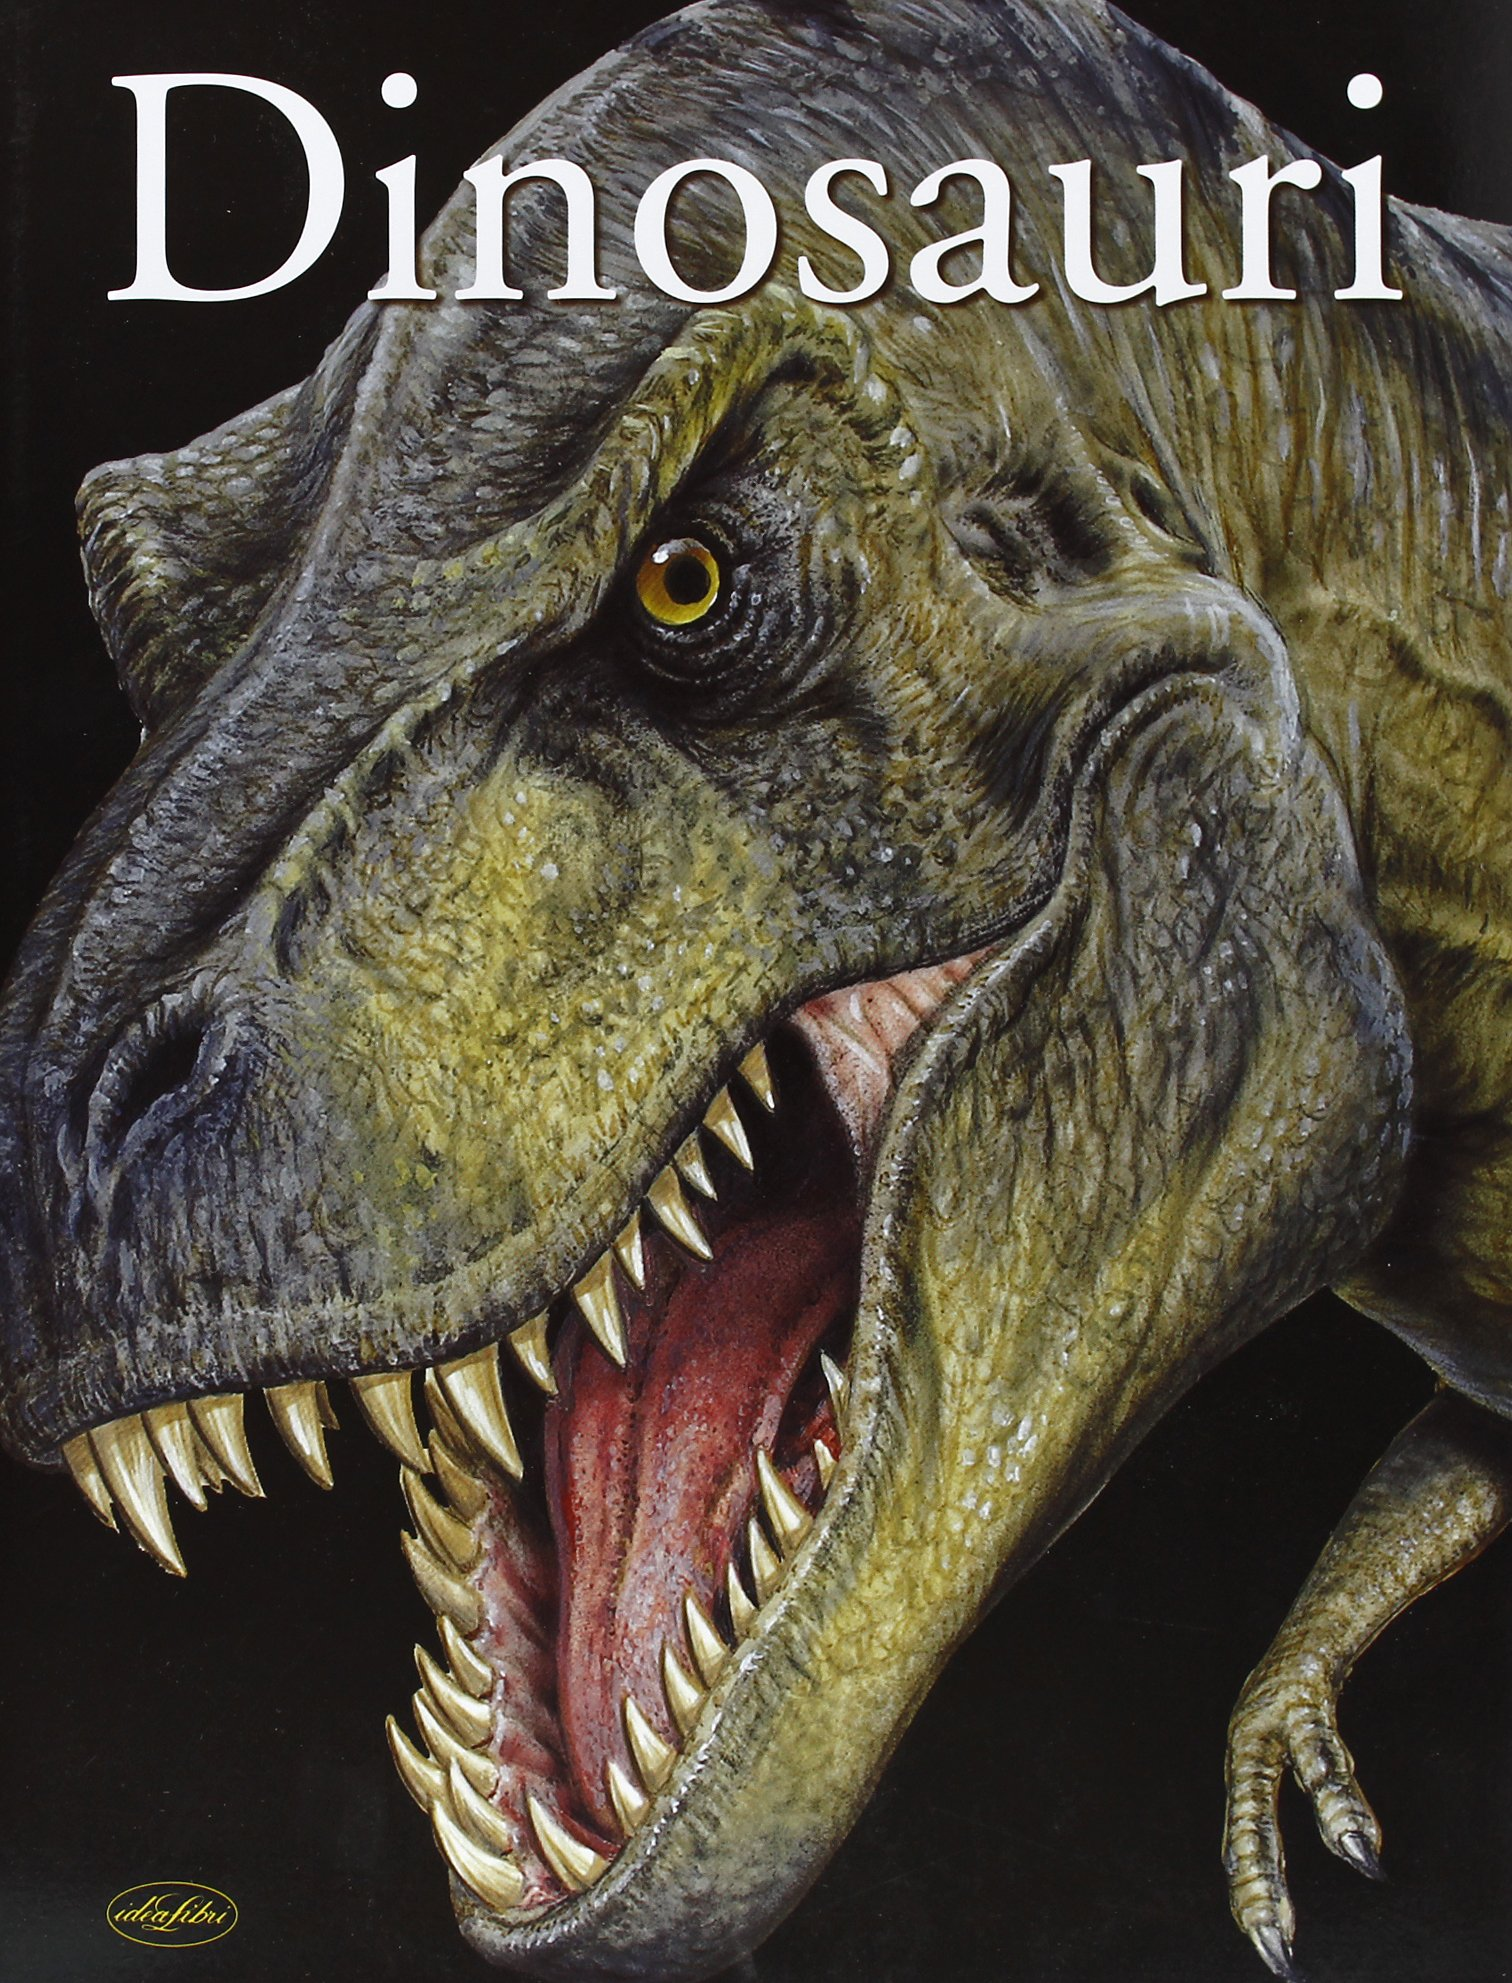 I dinosauri. Ediz. illustrata: : Aa.vv., Idea libri: Libri